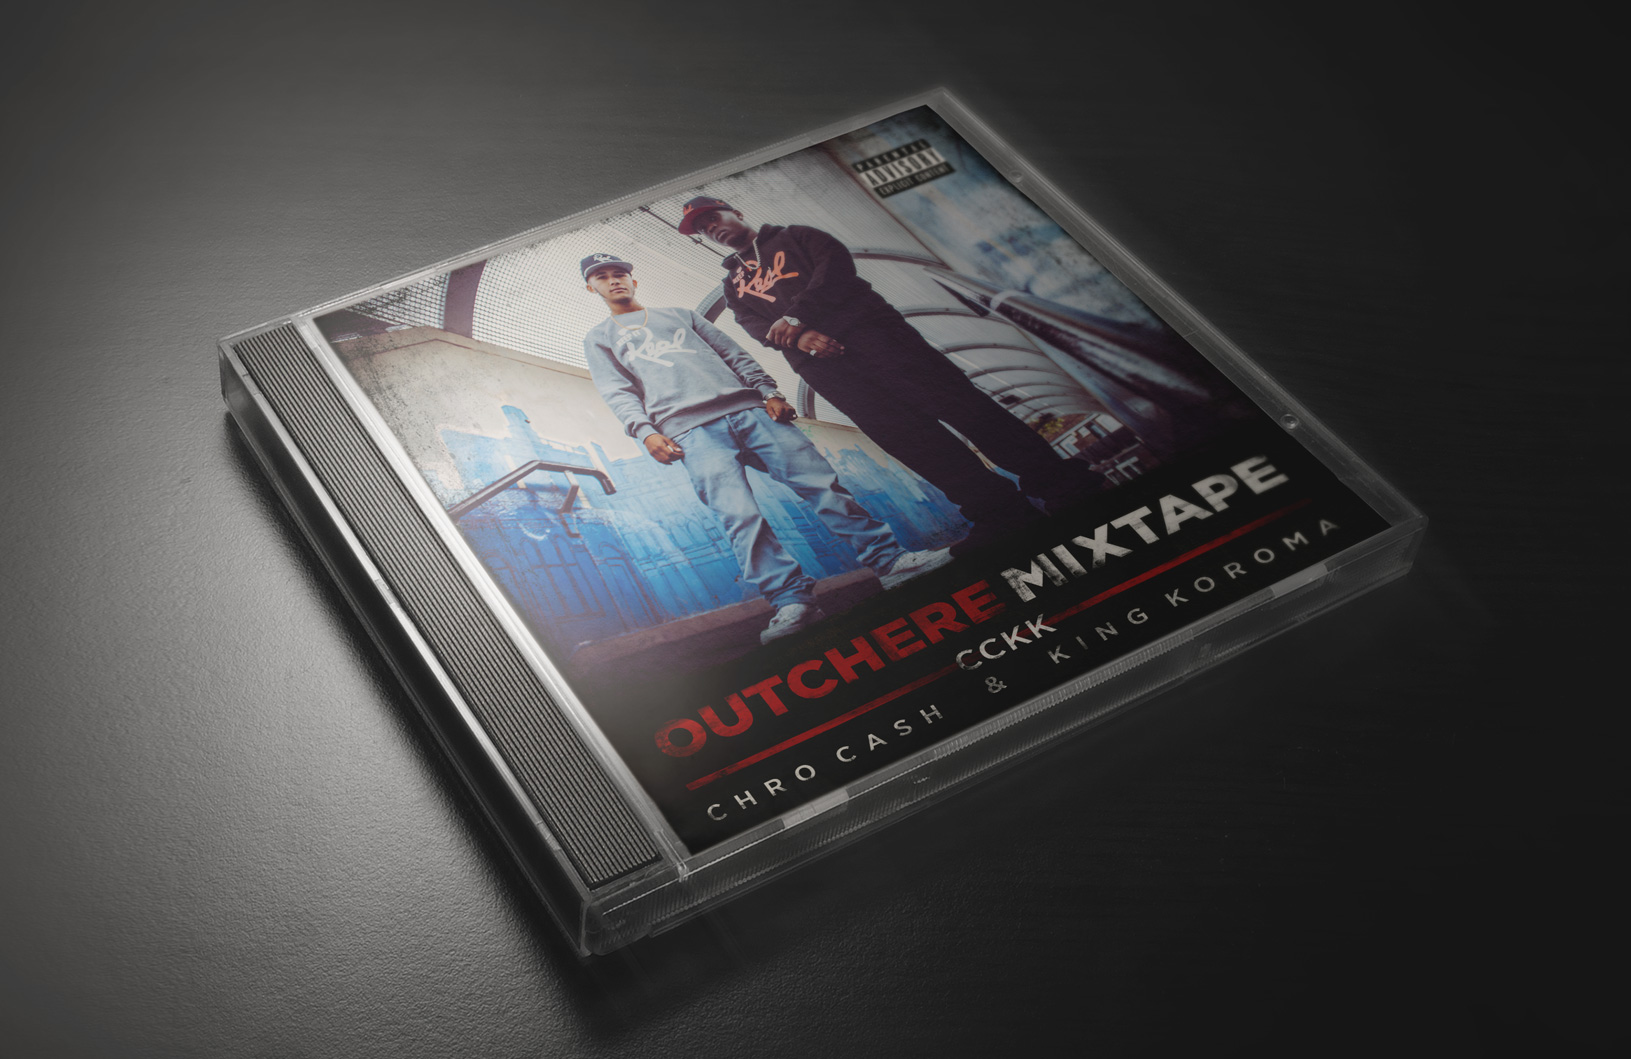 Outchere Mixtape